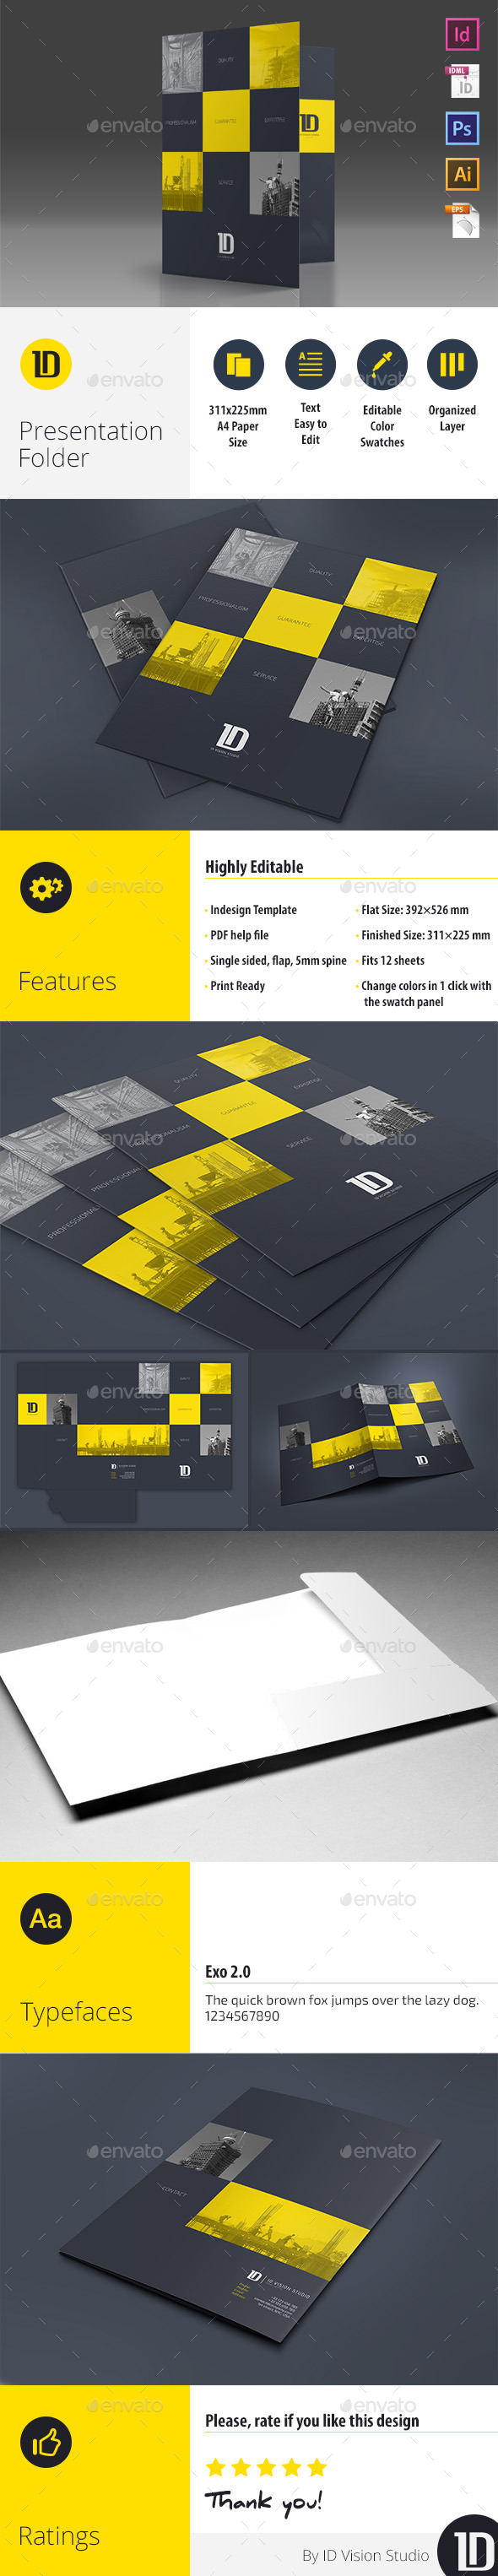 A4 Self Locking Multipurpose Presentation Folder 002 - Stationery Print Templates